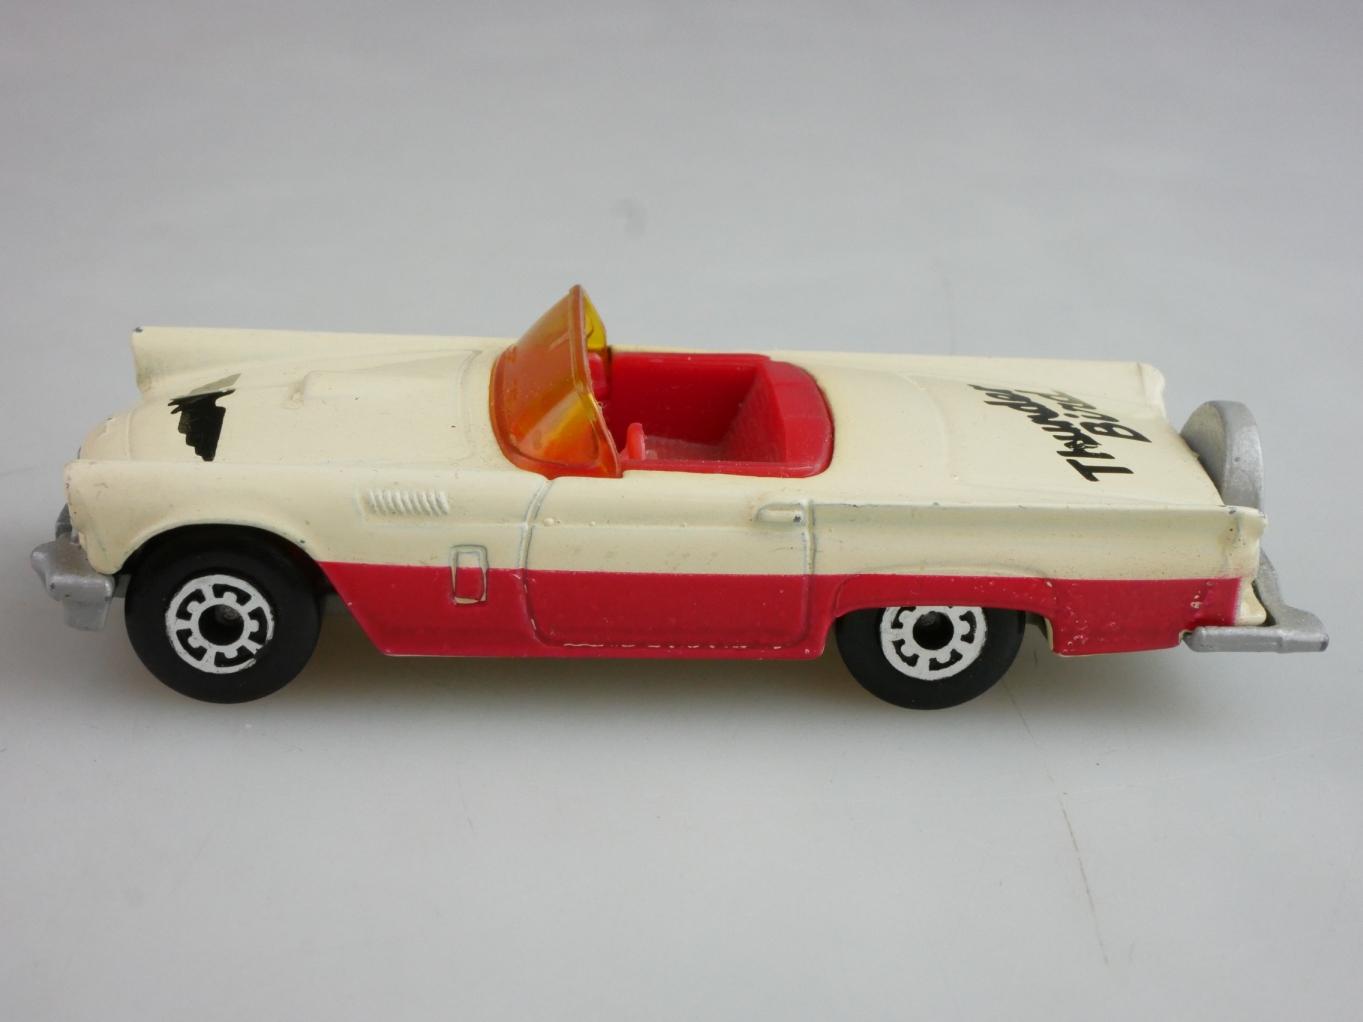 Utility Truck (33-G/74-I) - 65097